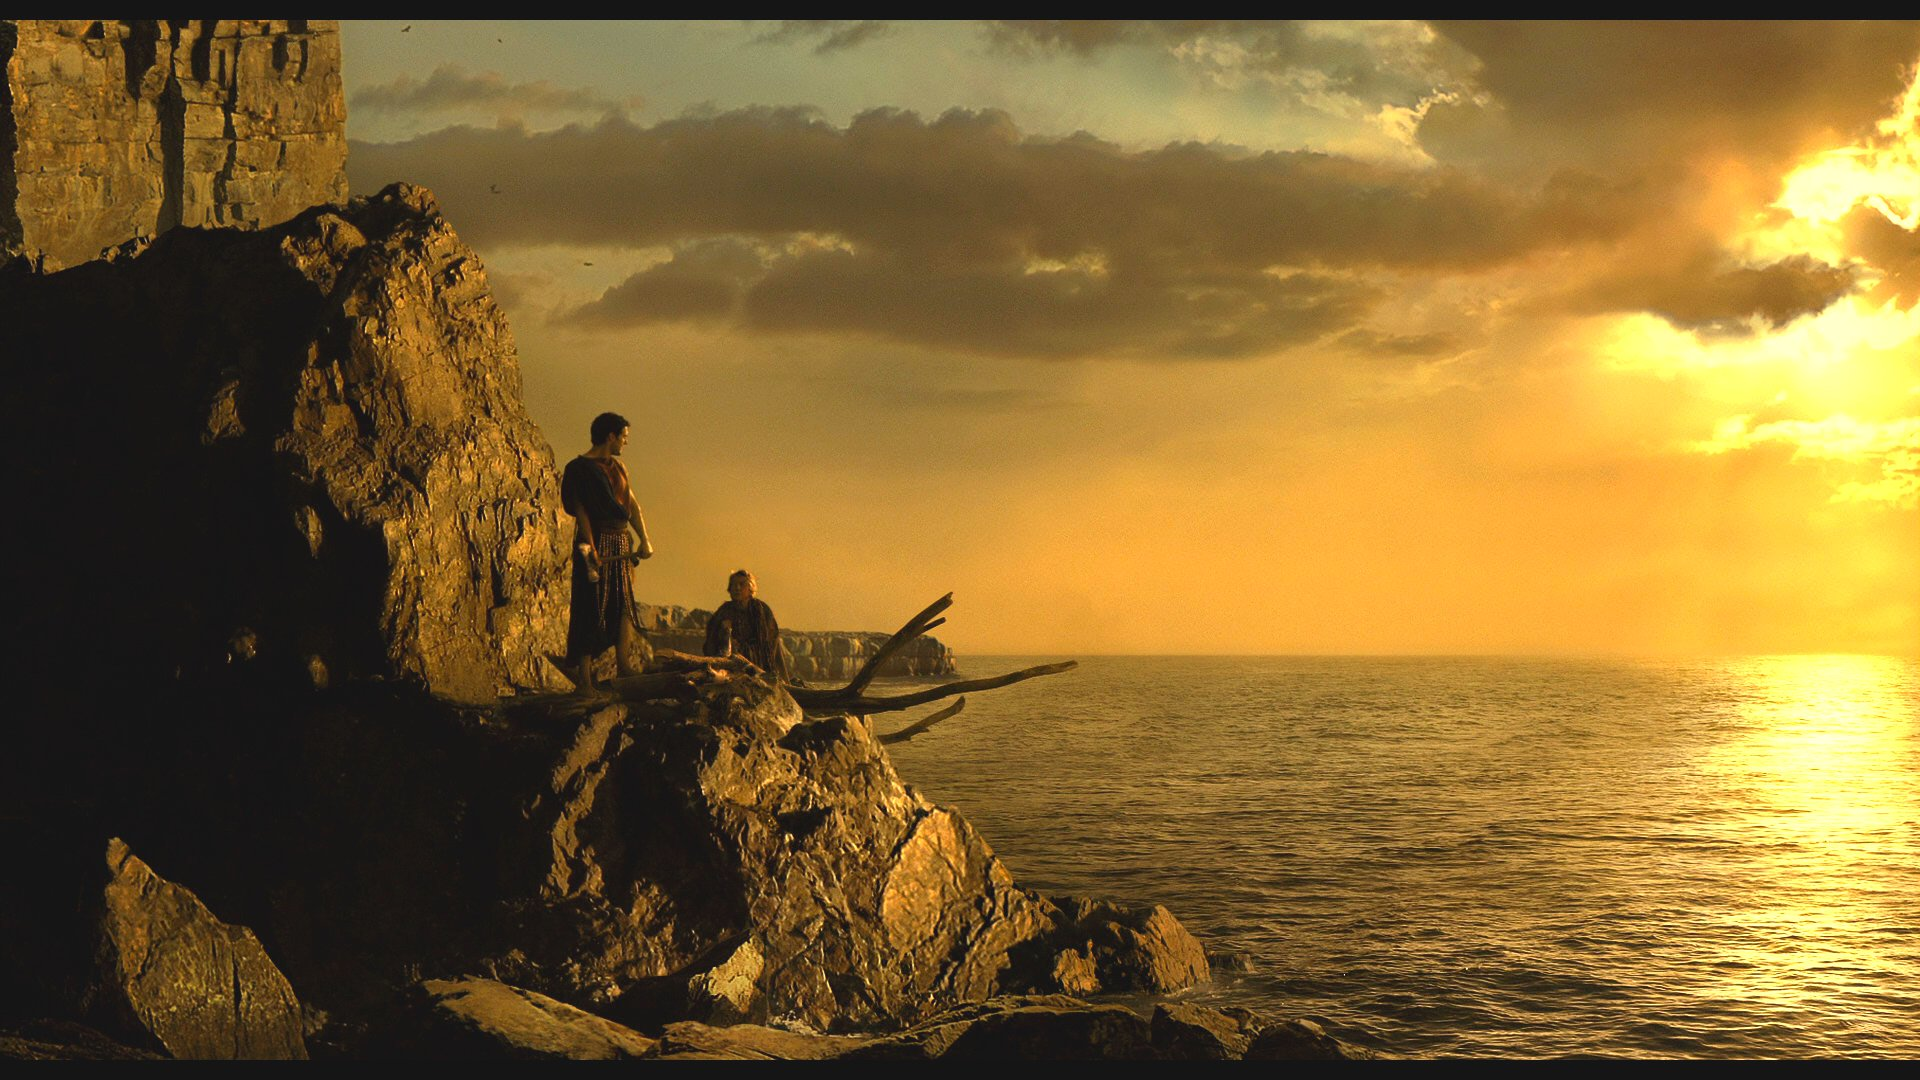 Paragliding Wallpaper Hd Immortals Fantasy Action Adventure Movie Film Warrior